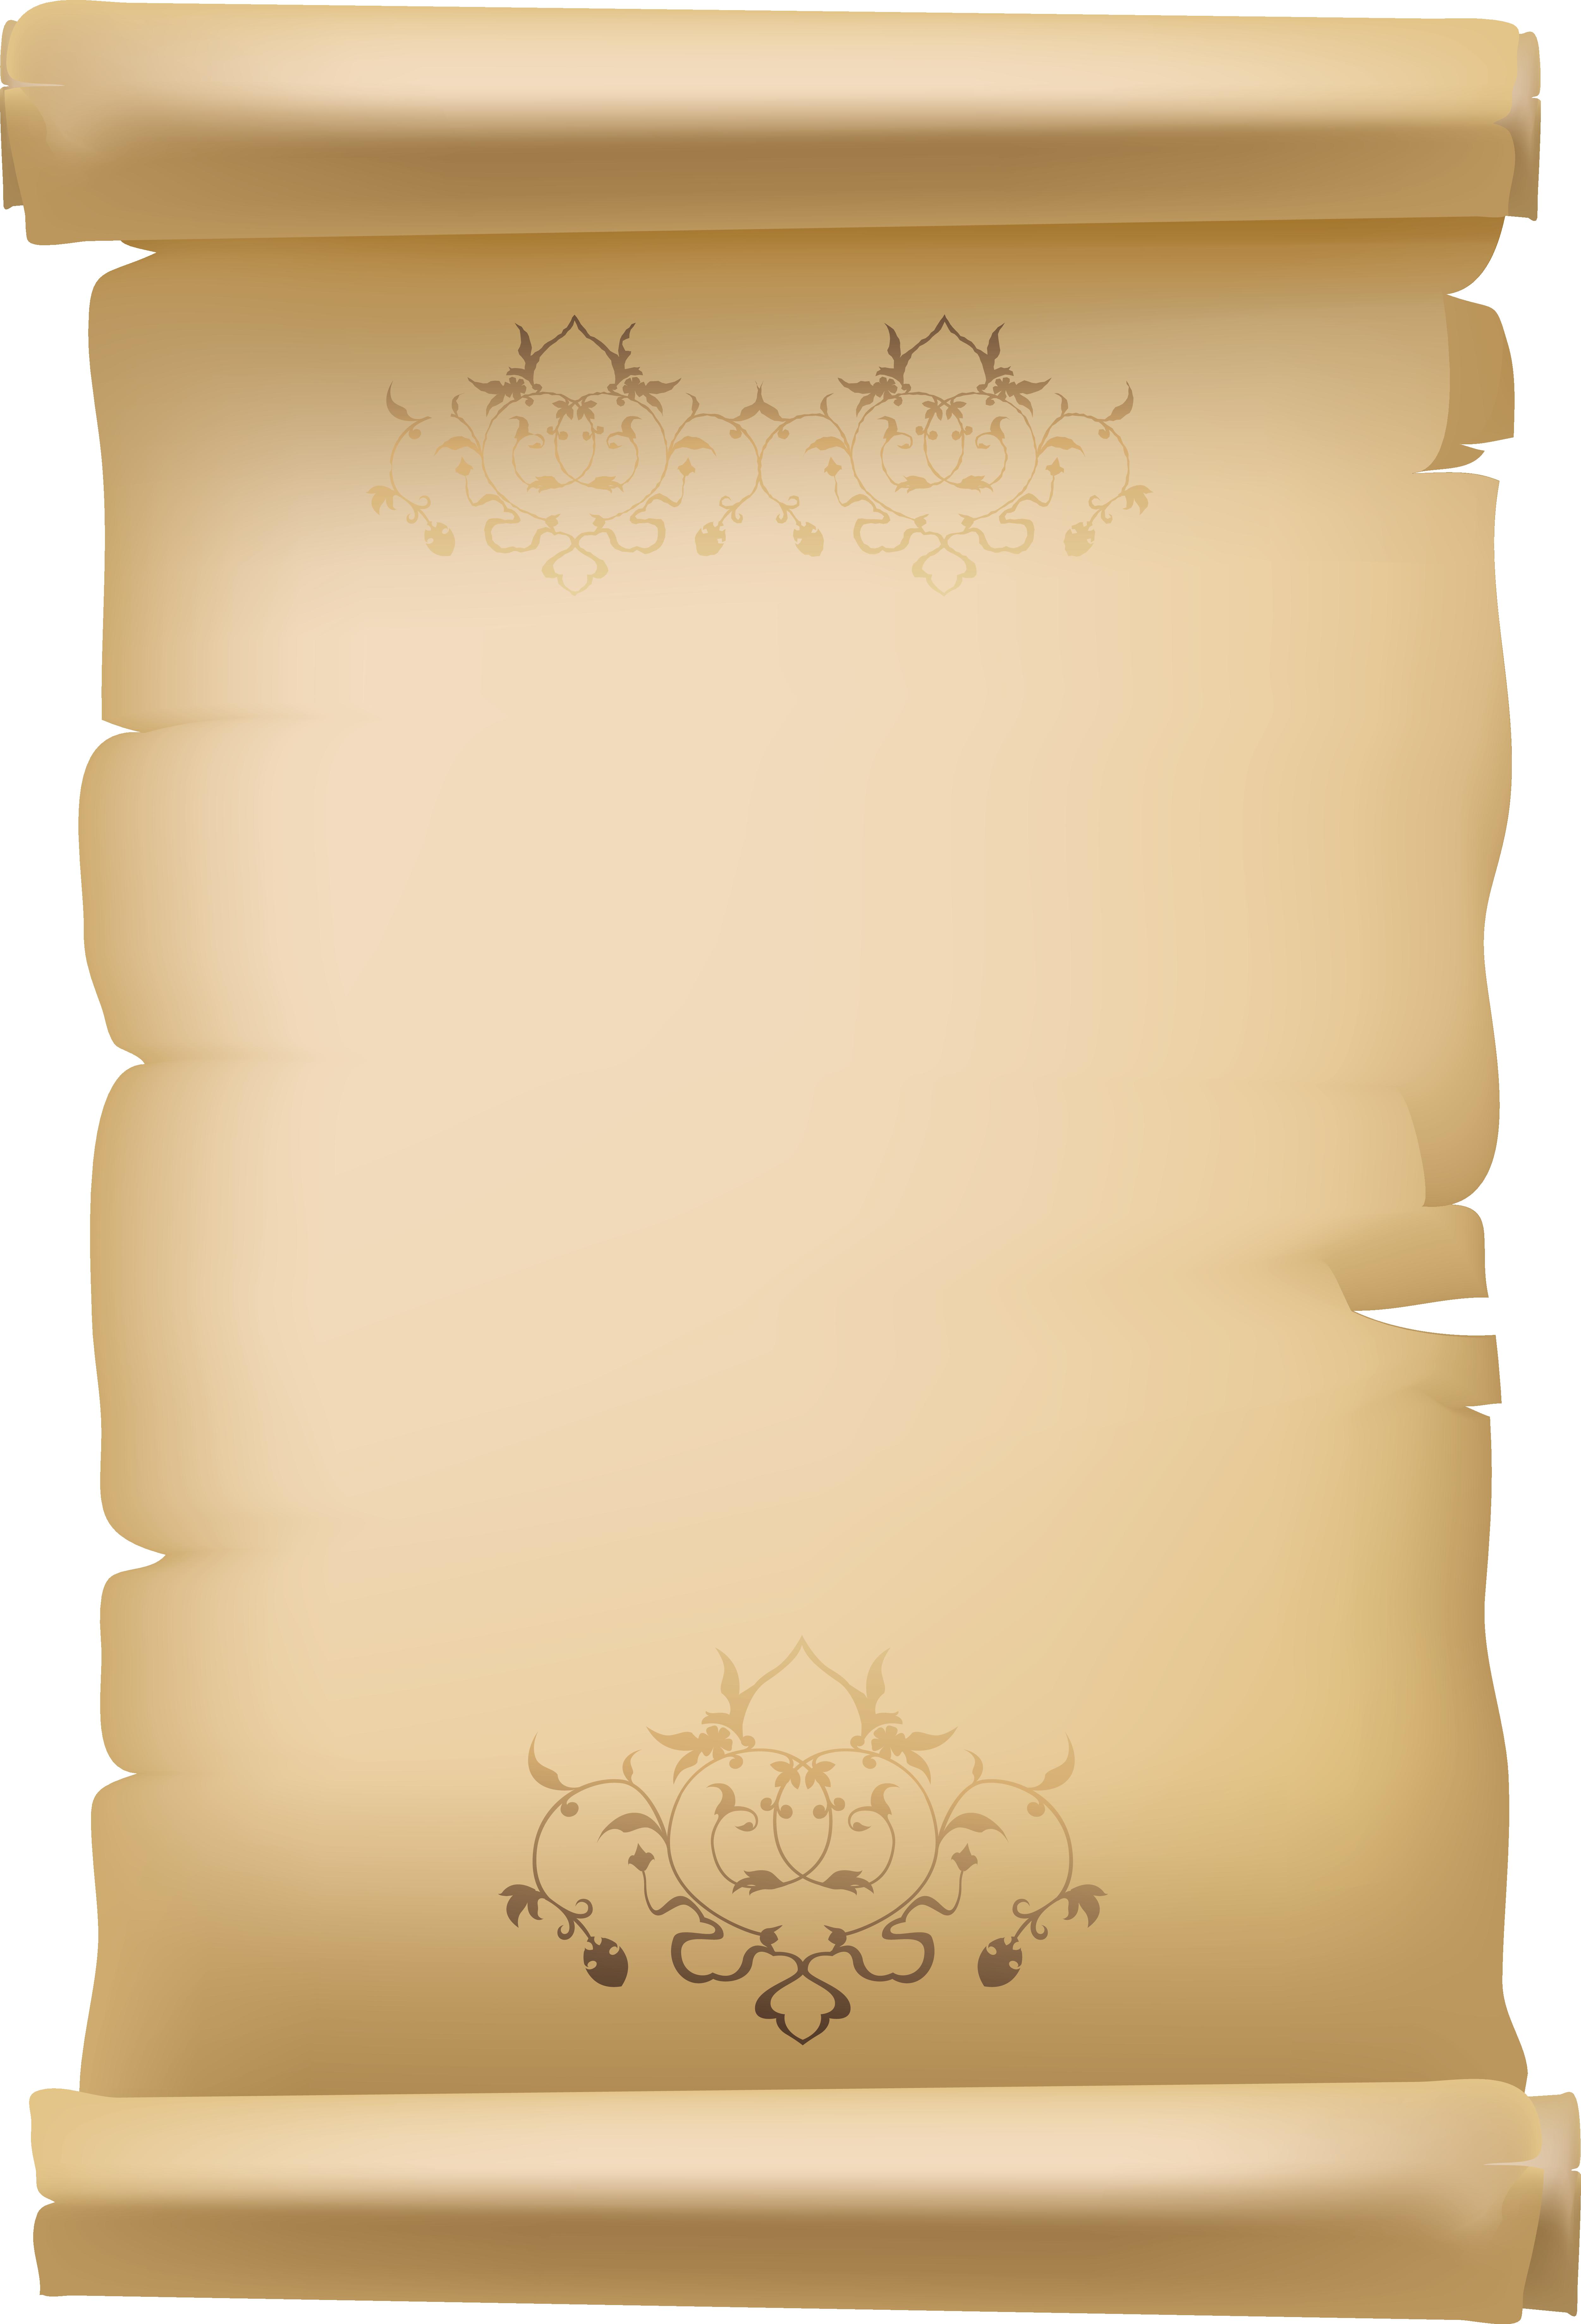 Diploma clipart scroll. Paper clip art transprent